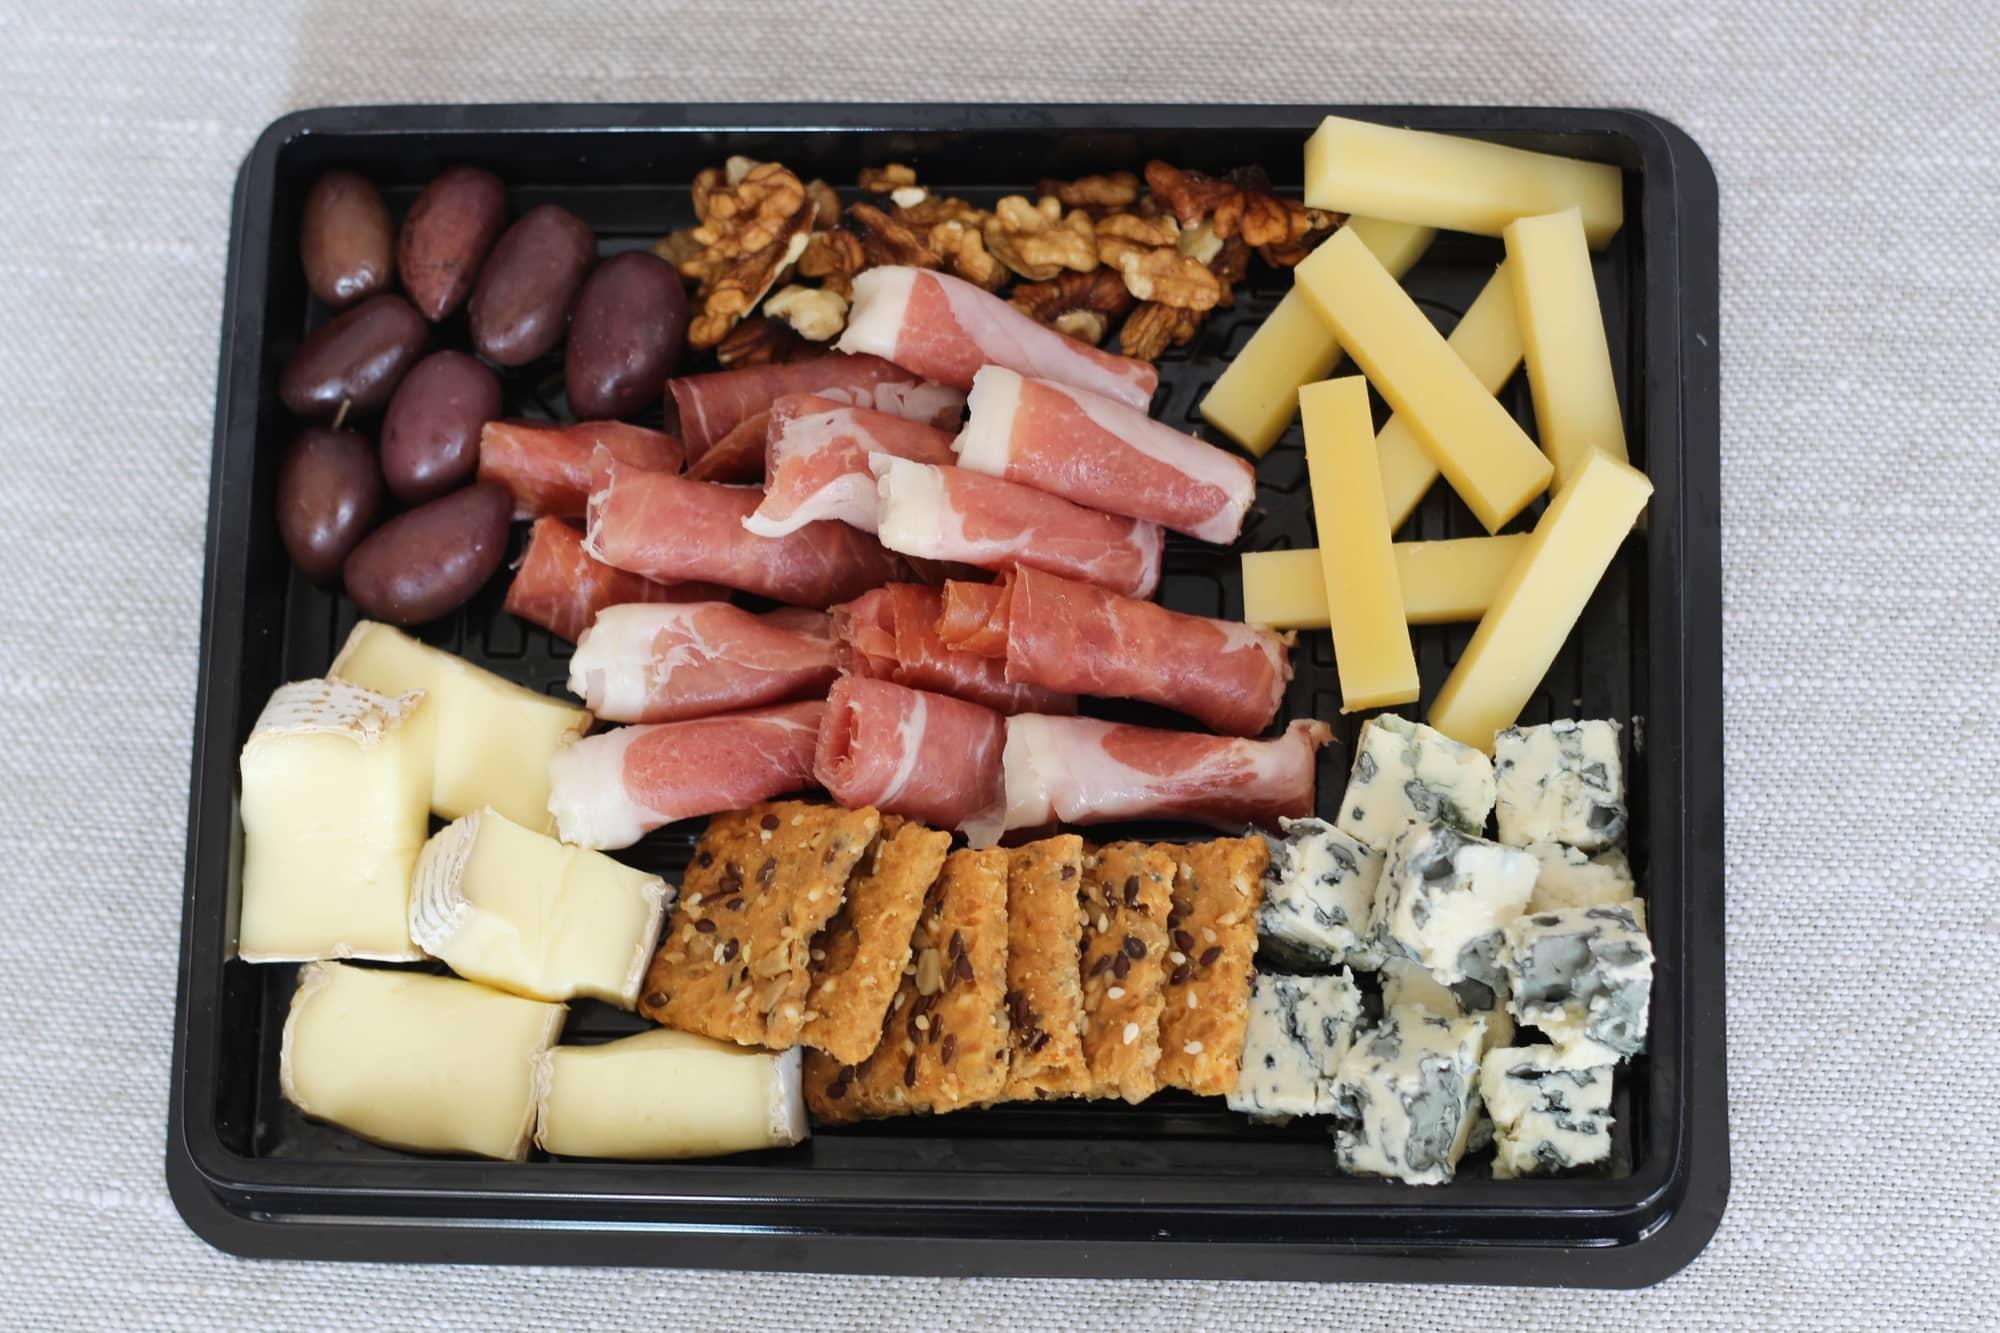 Kod Francuza, ketering, sir, cheese, francuski sirevi, french cheese, Pariz